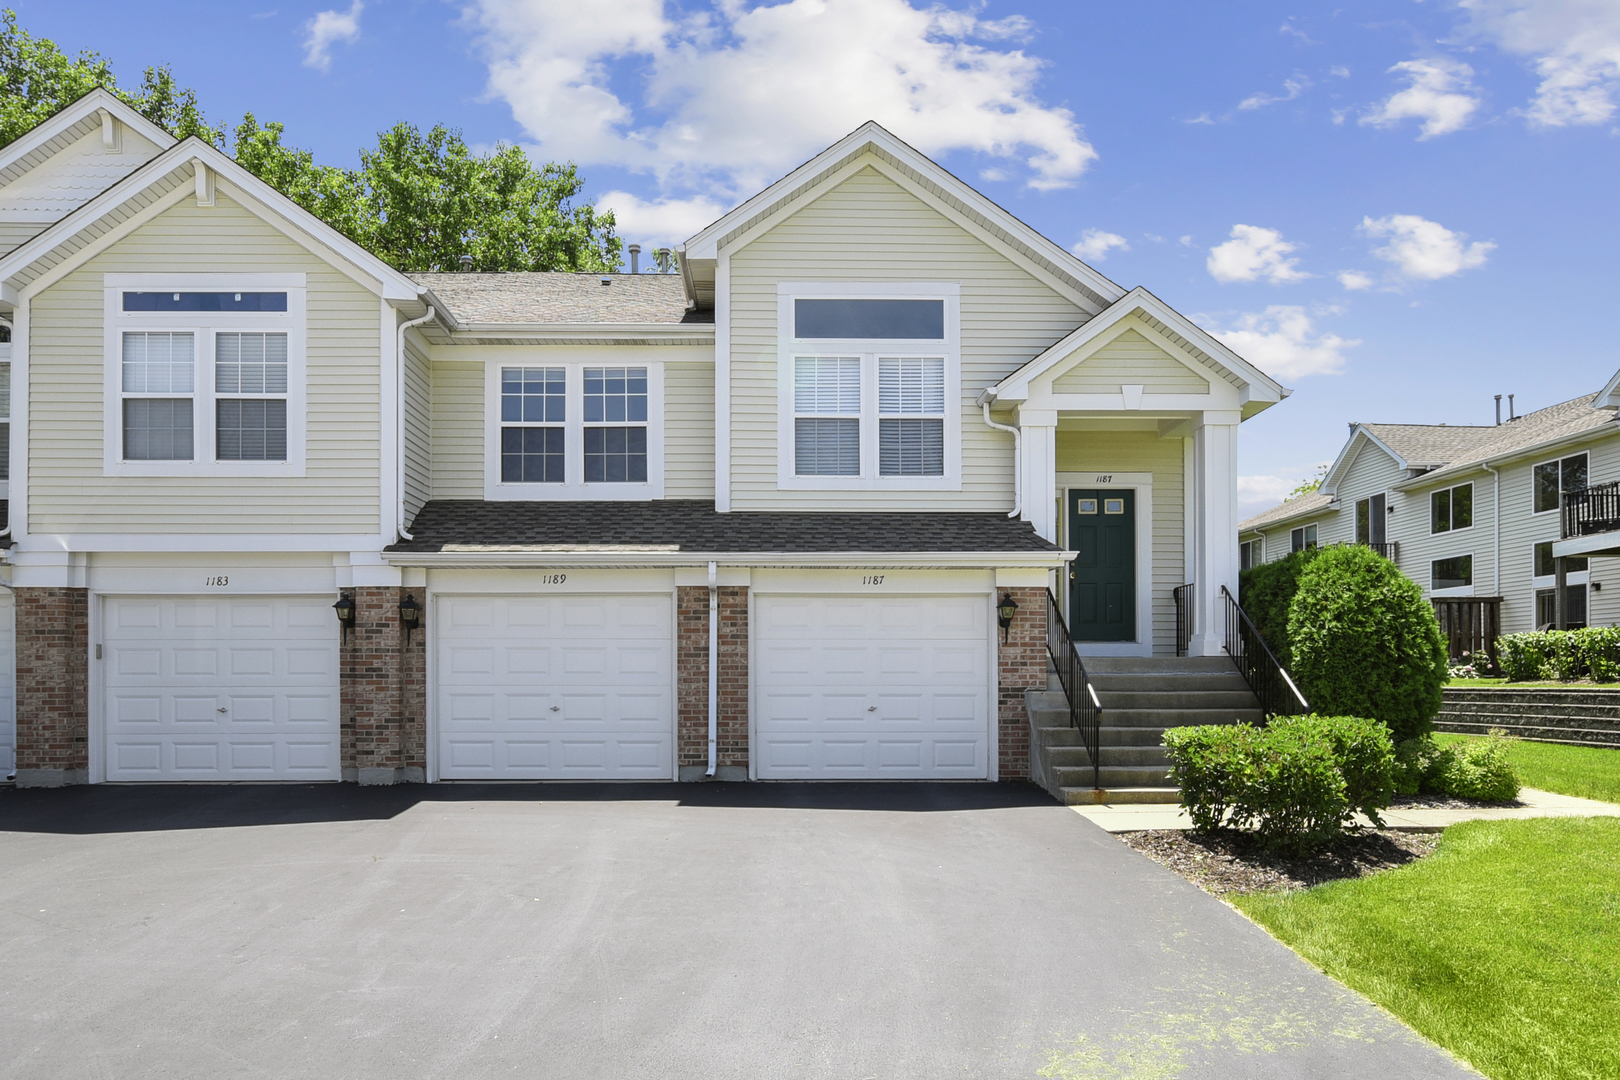 1189 Hawthorne, ELK GROVE VILLAGE, Illinois, 60007